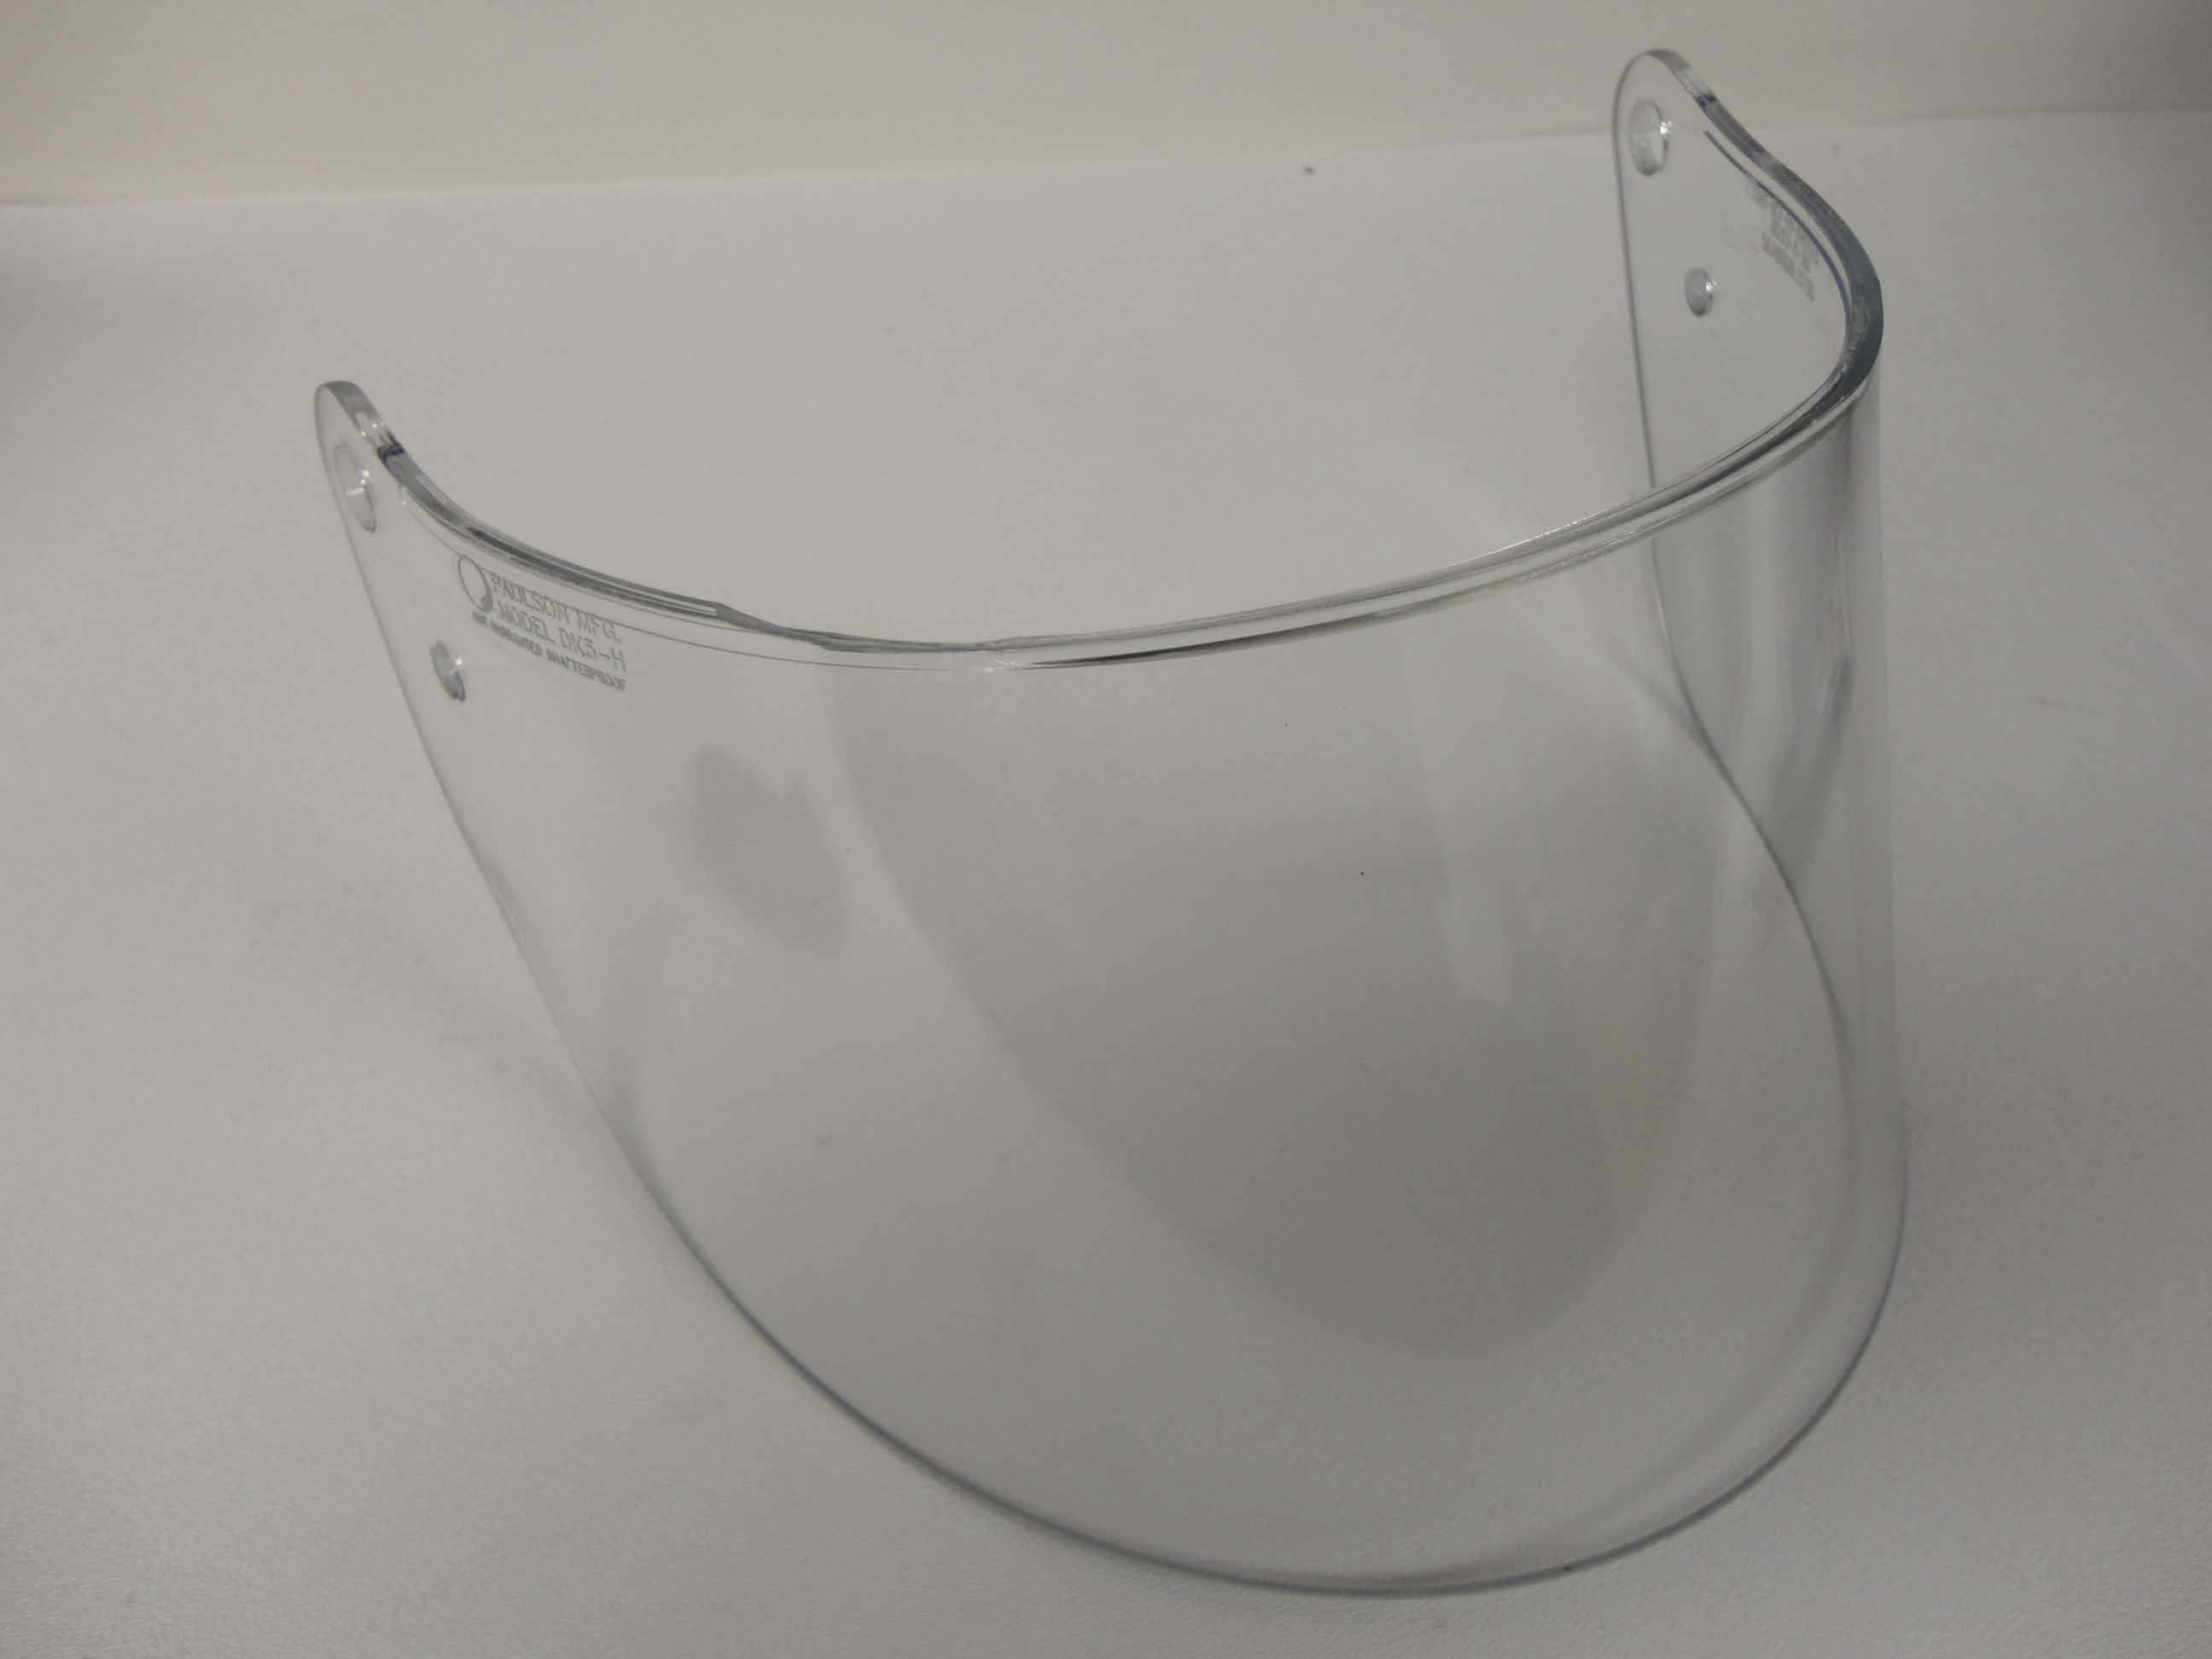 Paulson DK5 Replacement Lens